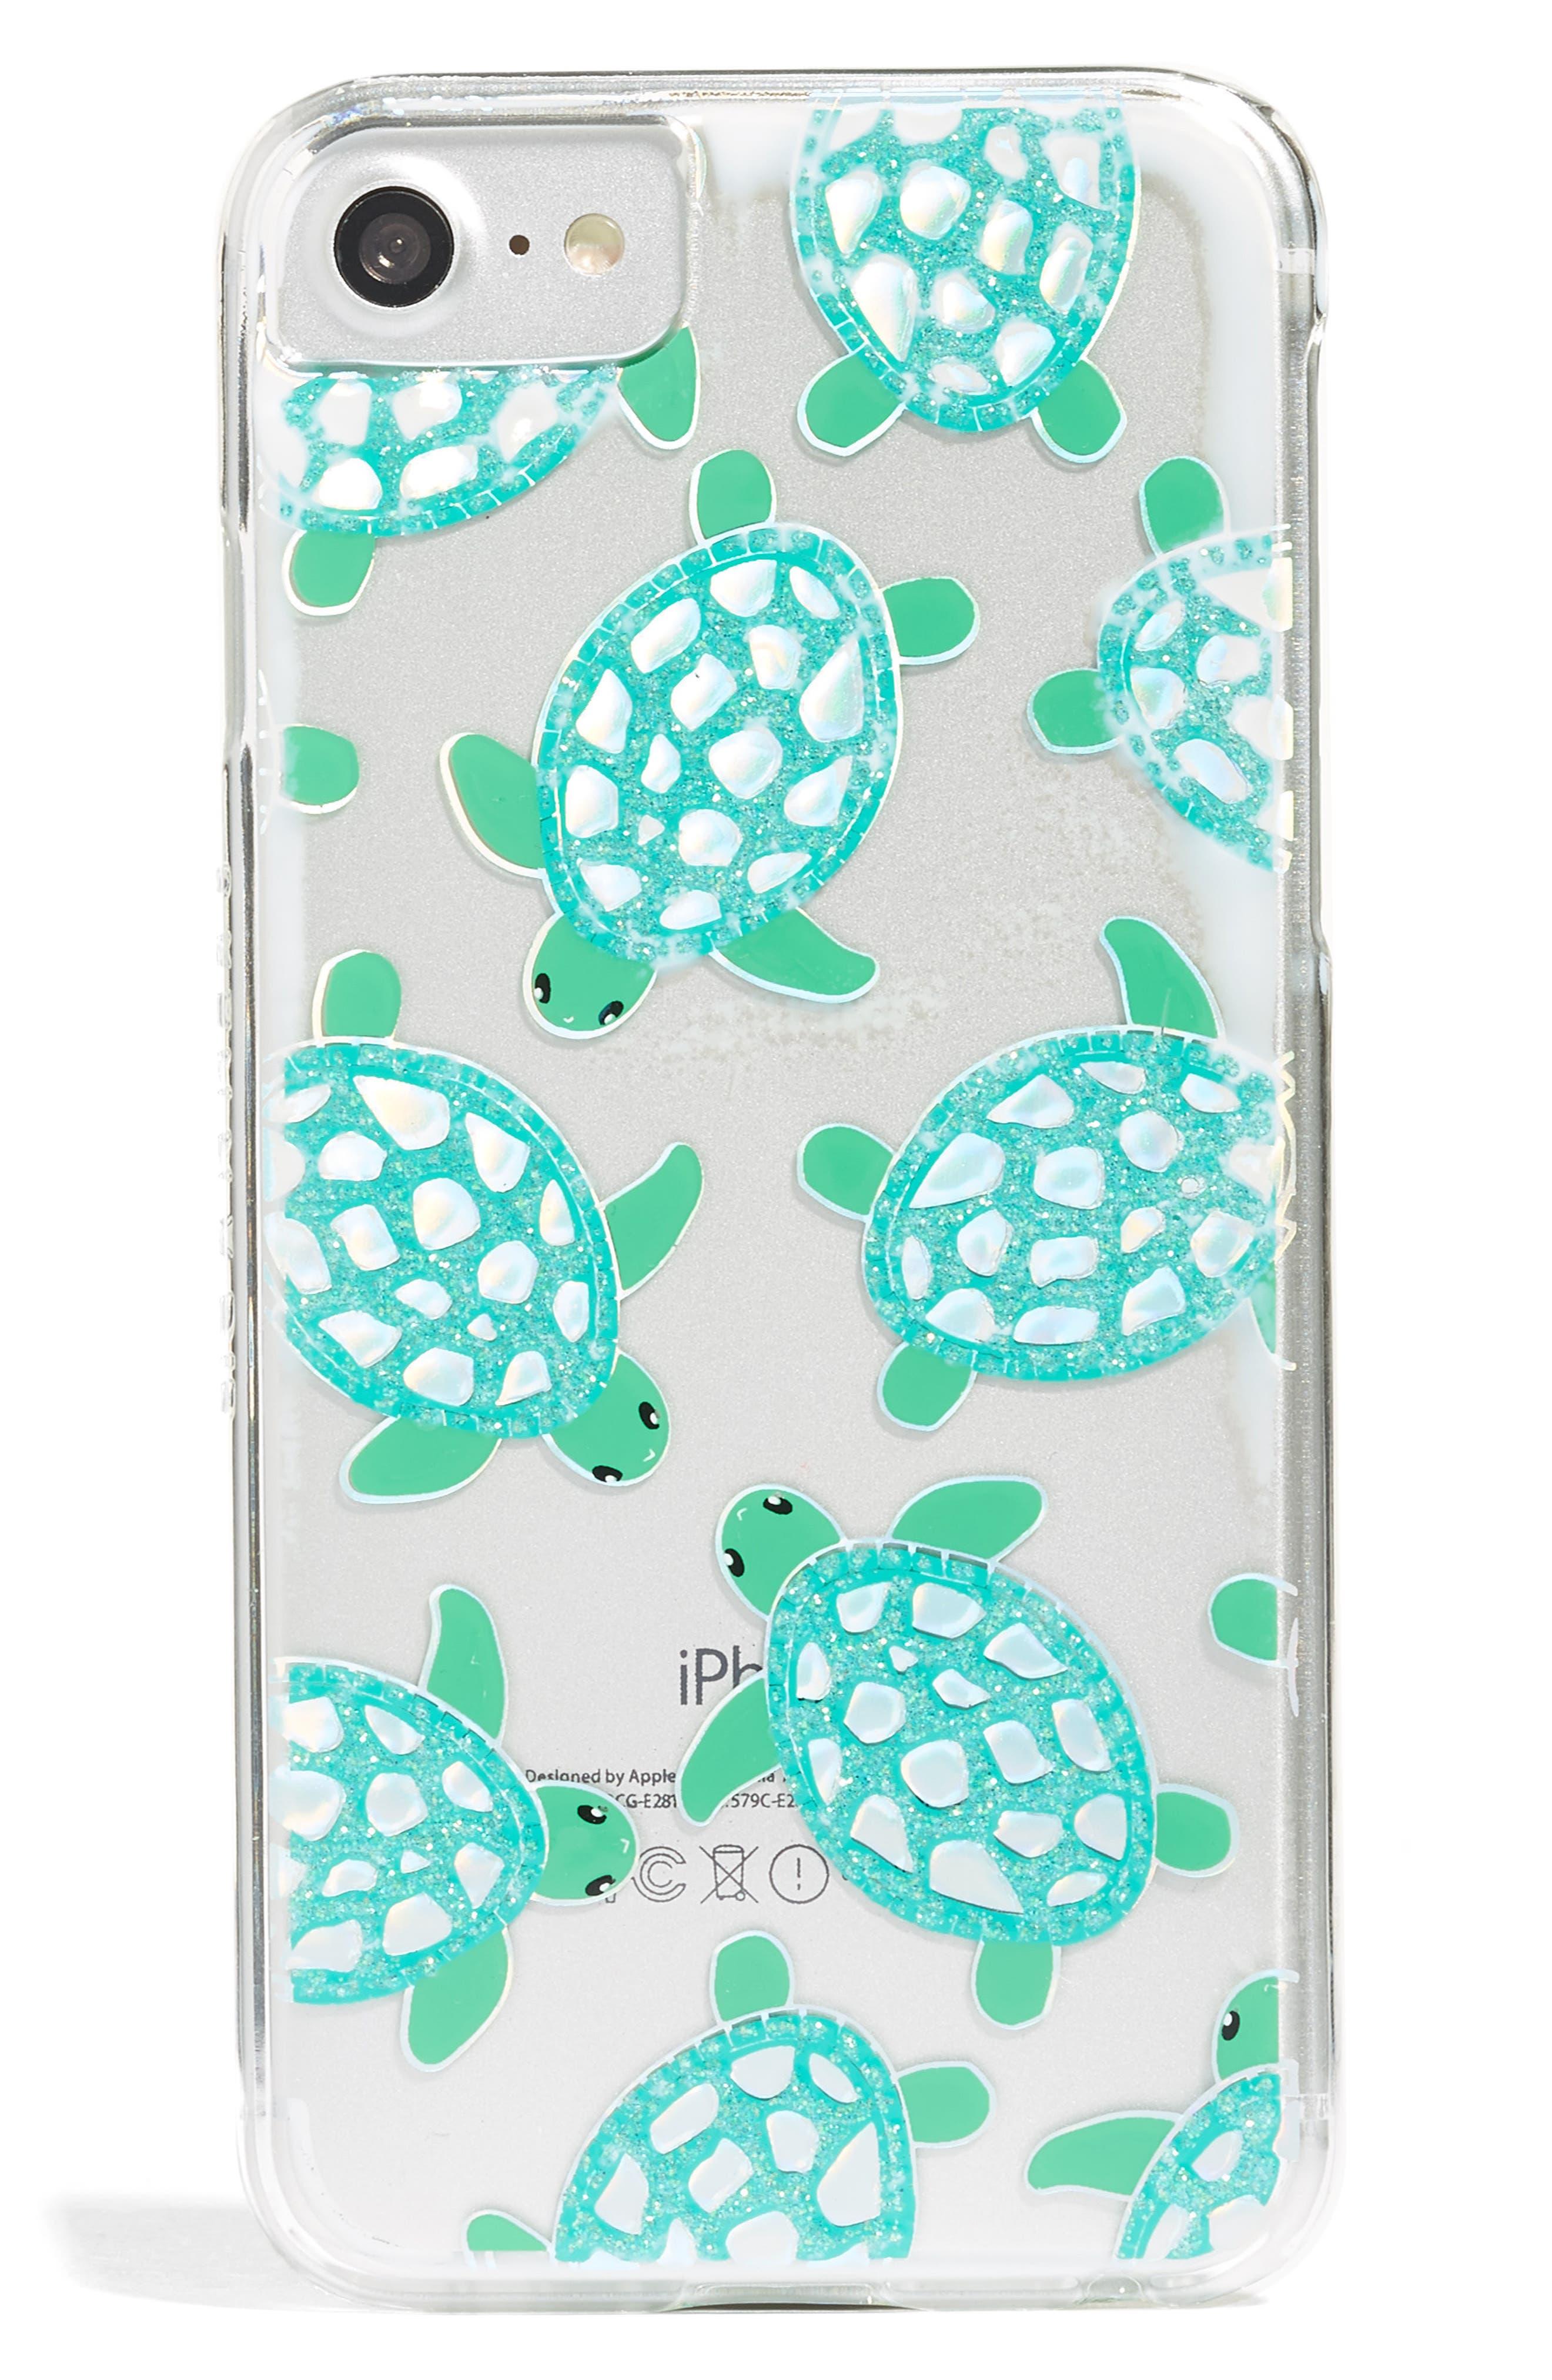 Main Image - Skinnydip Turtle iPhone Case (6/7 & 6/7 Plus)